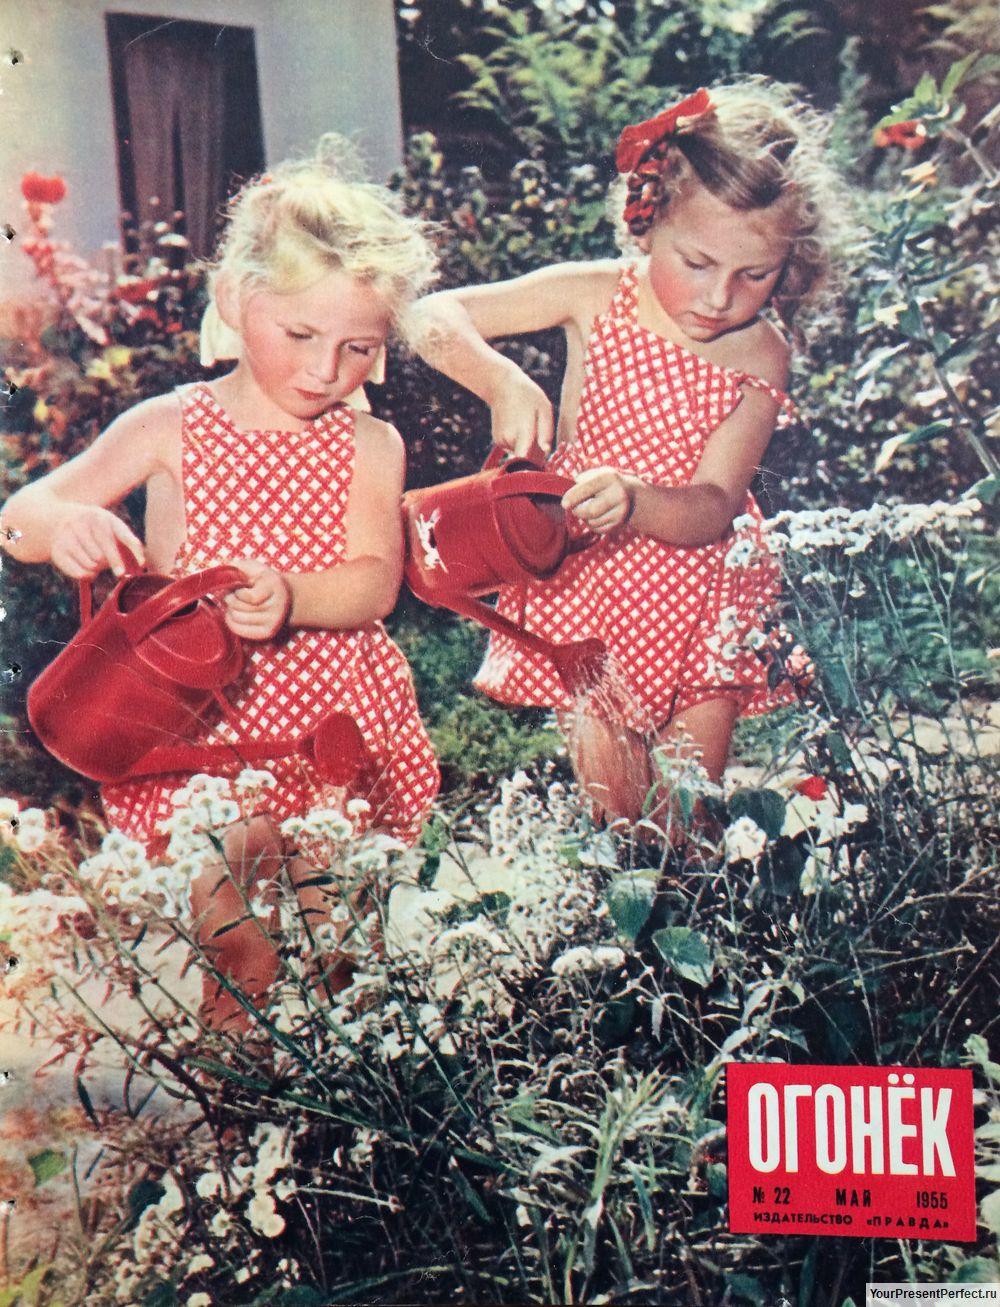 Журнал Огонек №22 май 1955